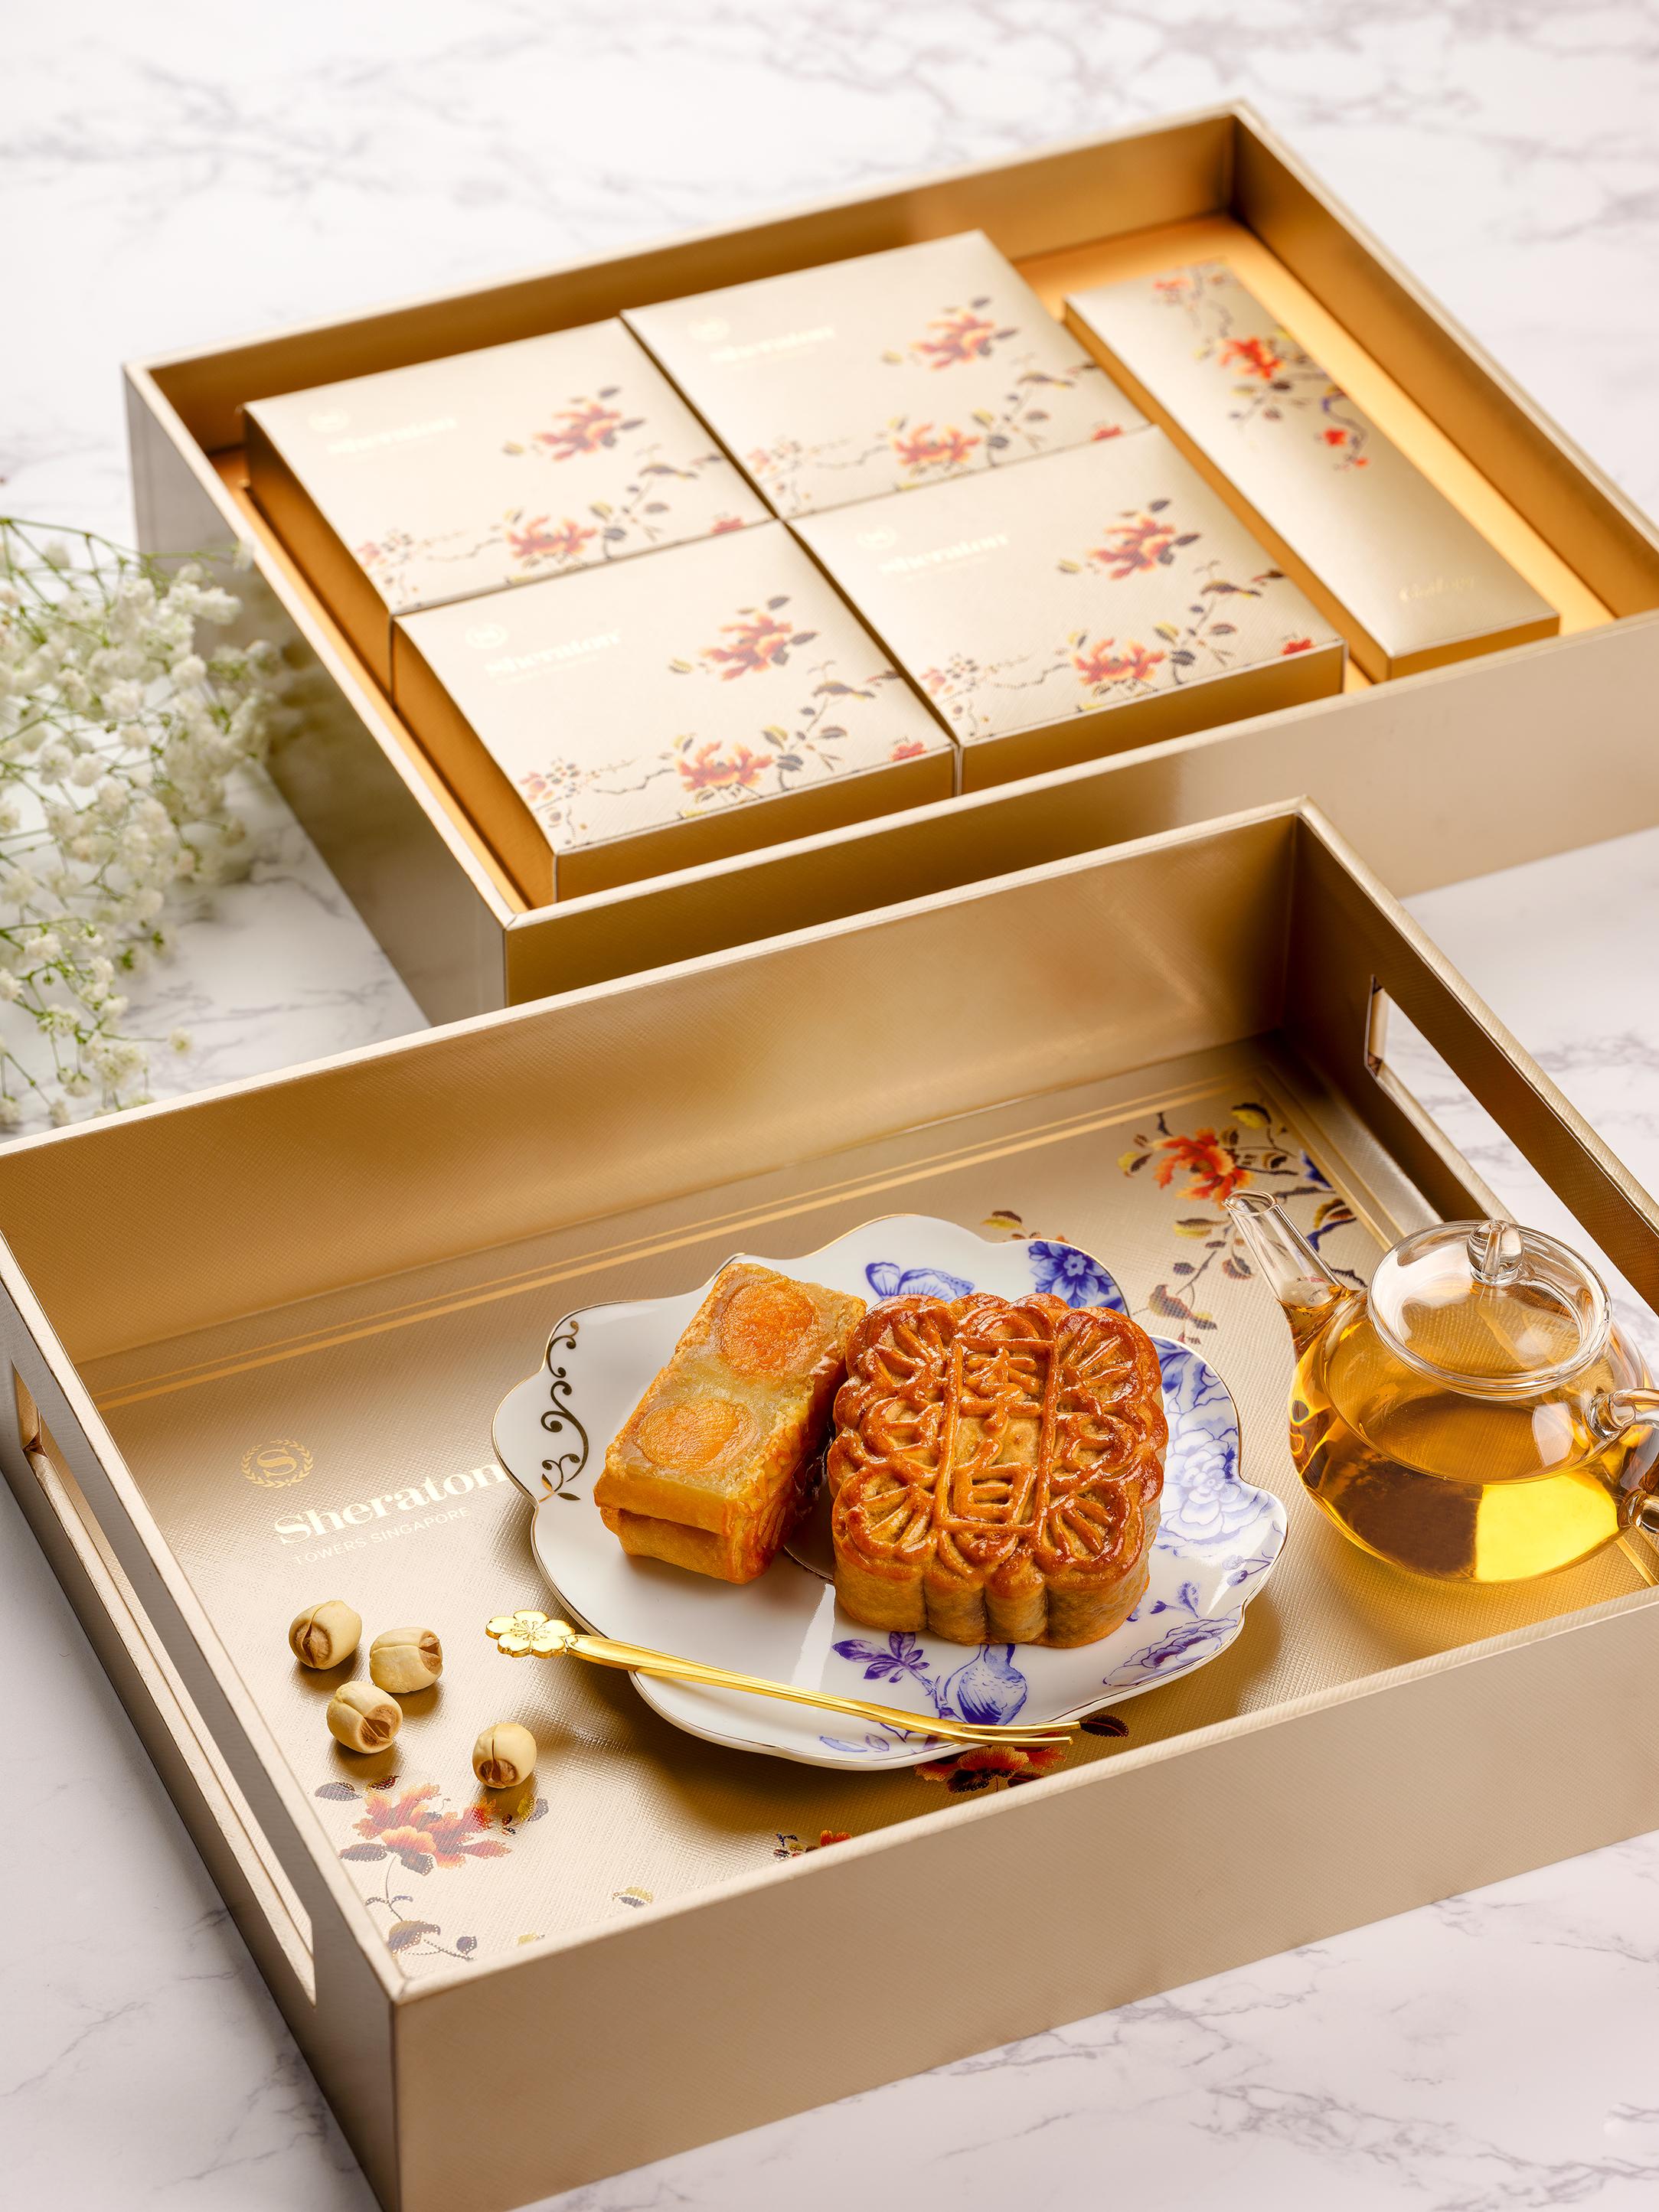 Sheraton Towers Singapore - Premium Box with White Lotus Seed Paste with Double Egg Yolks Mooncake.jpg